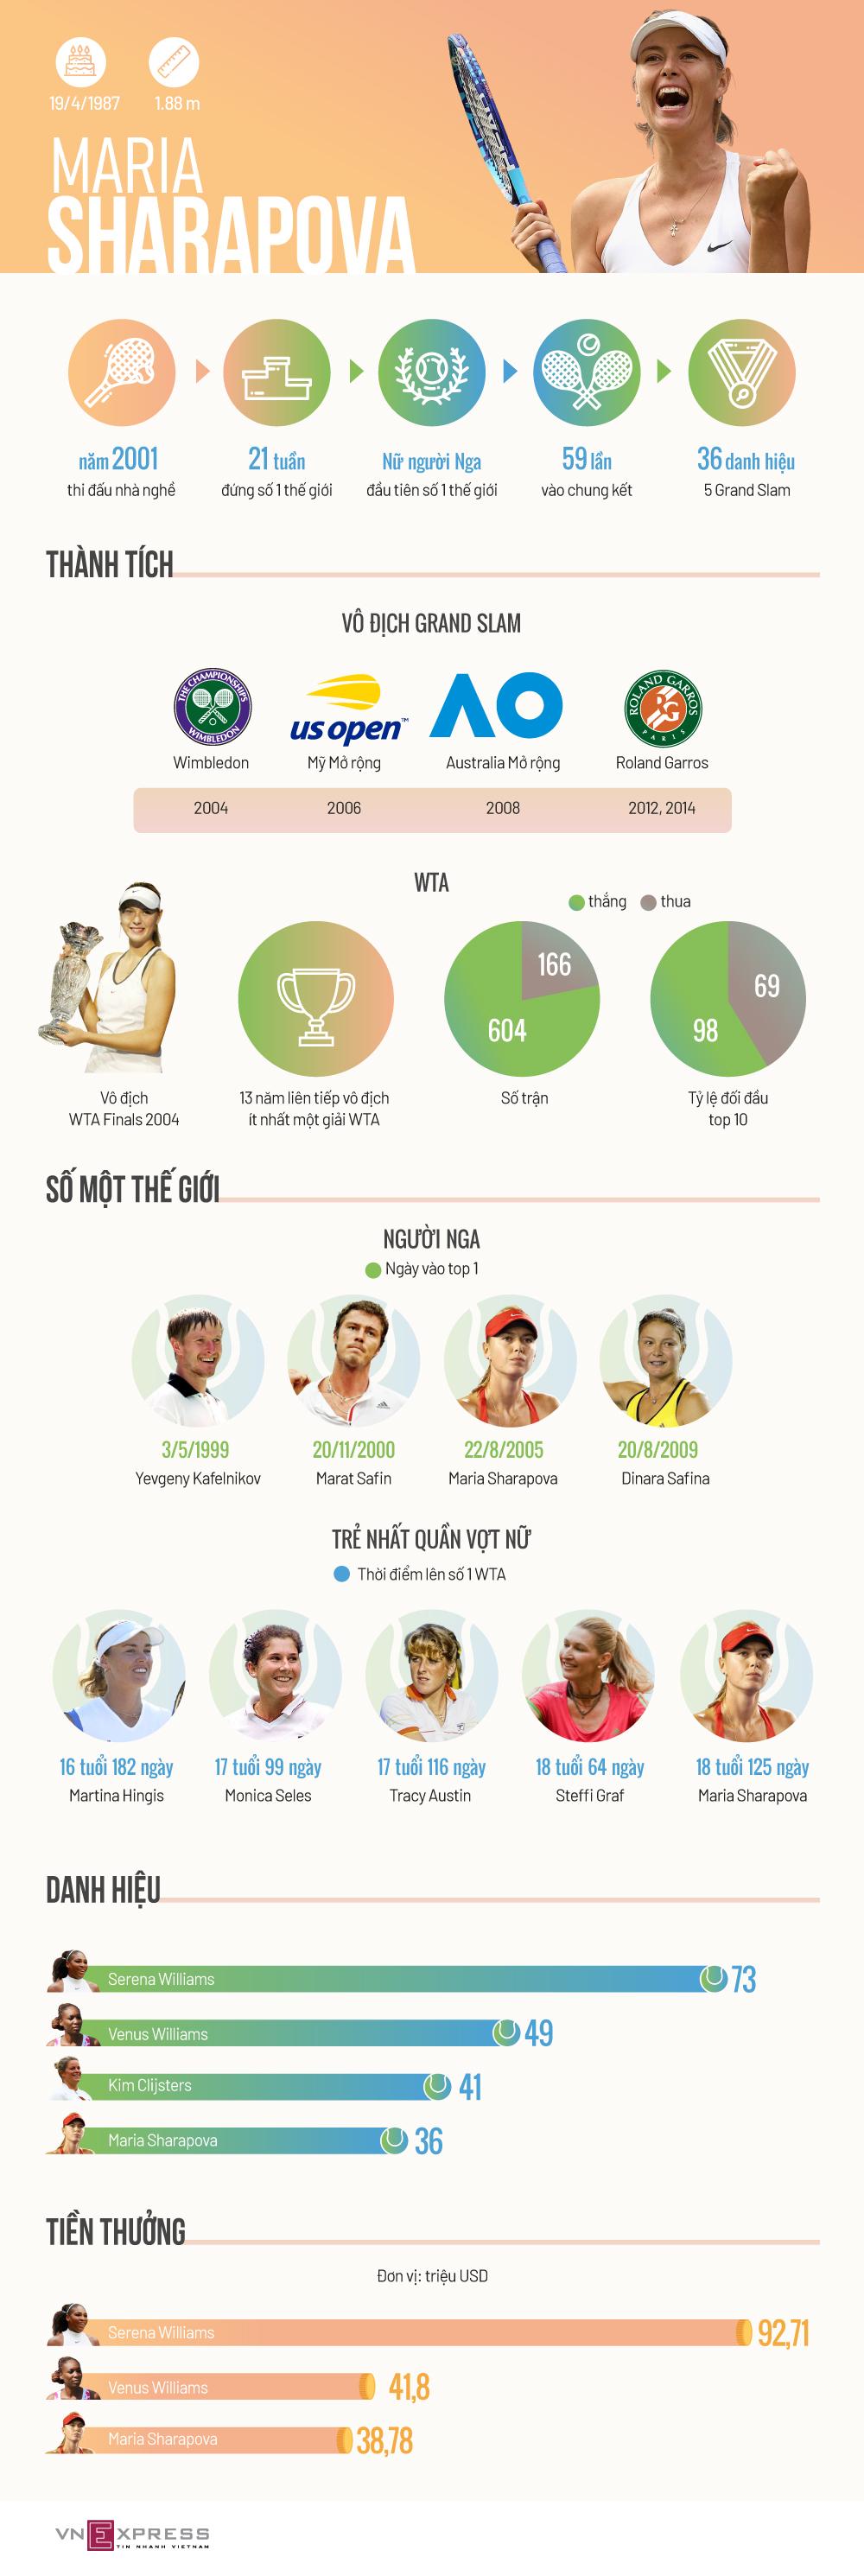 Sự nghiệp vàng son của Maria Sharapova